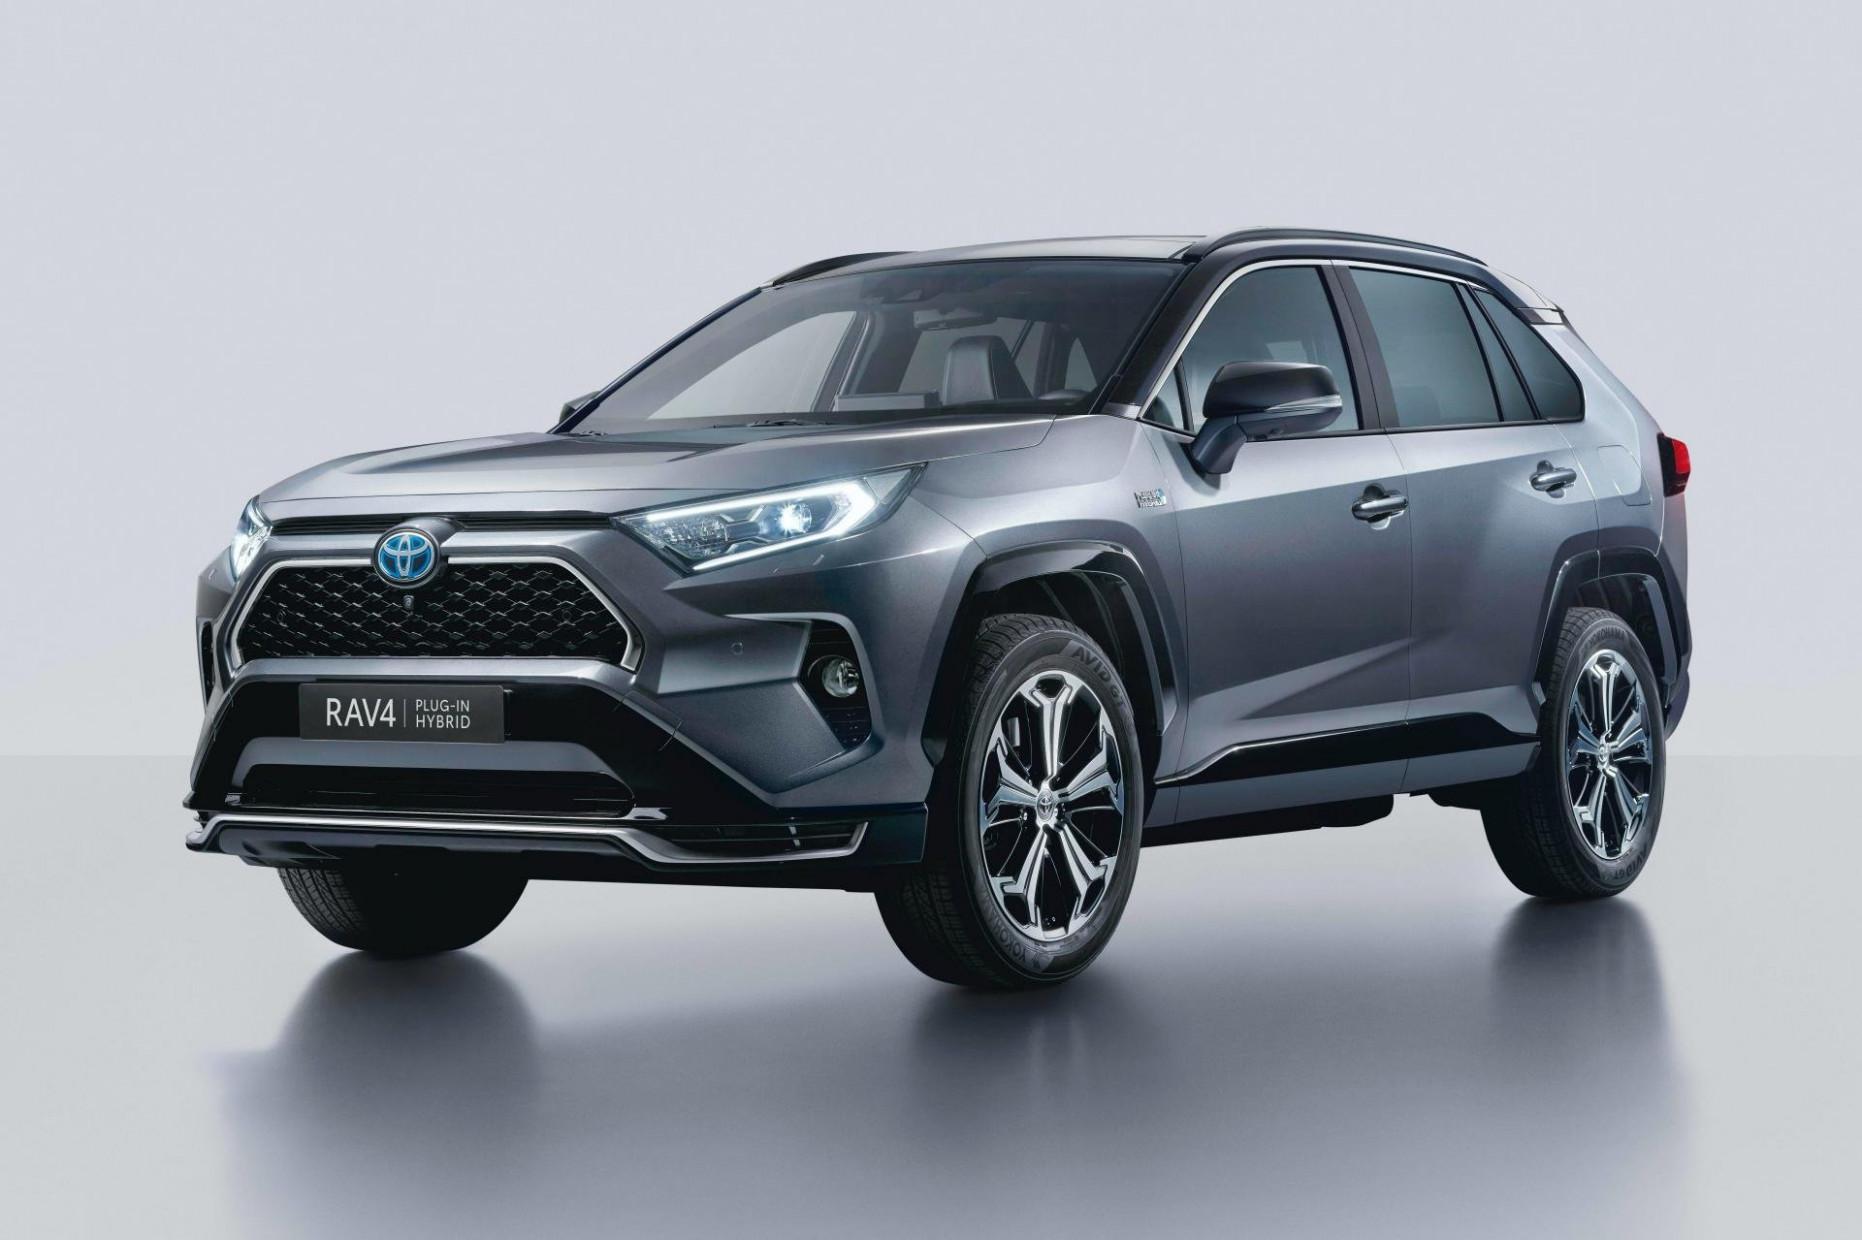 Redesign and Concept 2022 Toyota Rav4 Hybrid